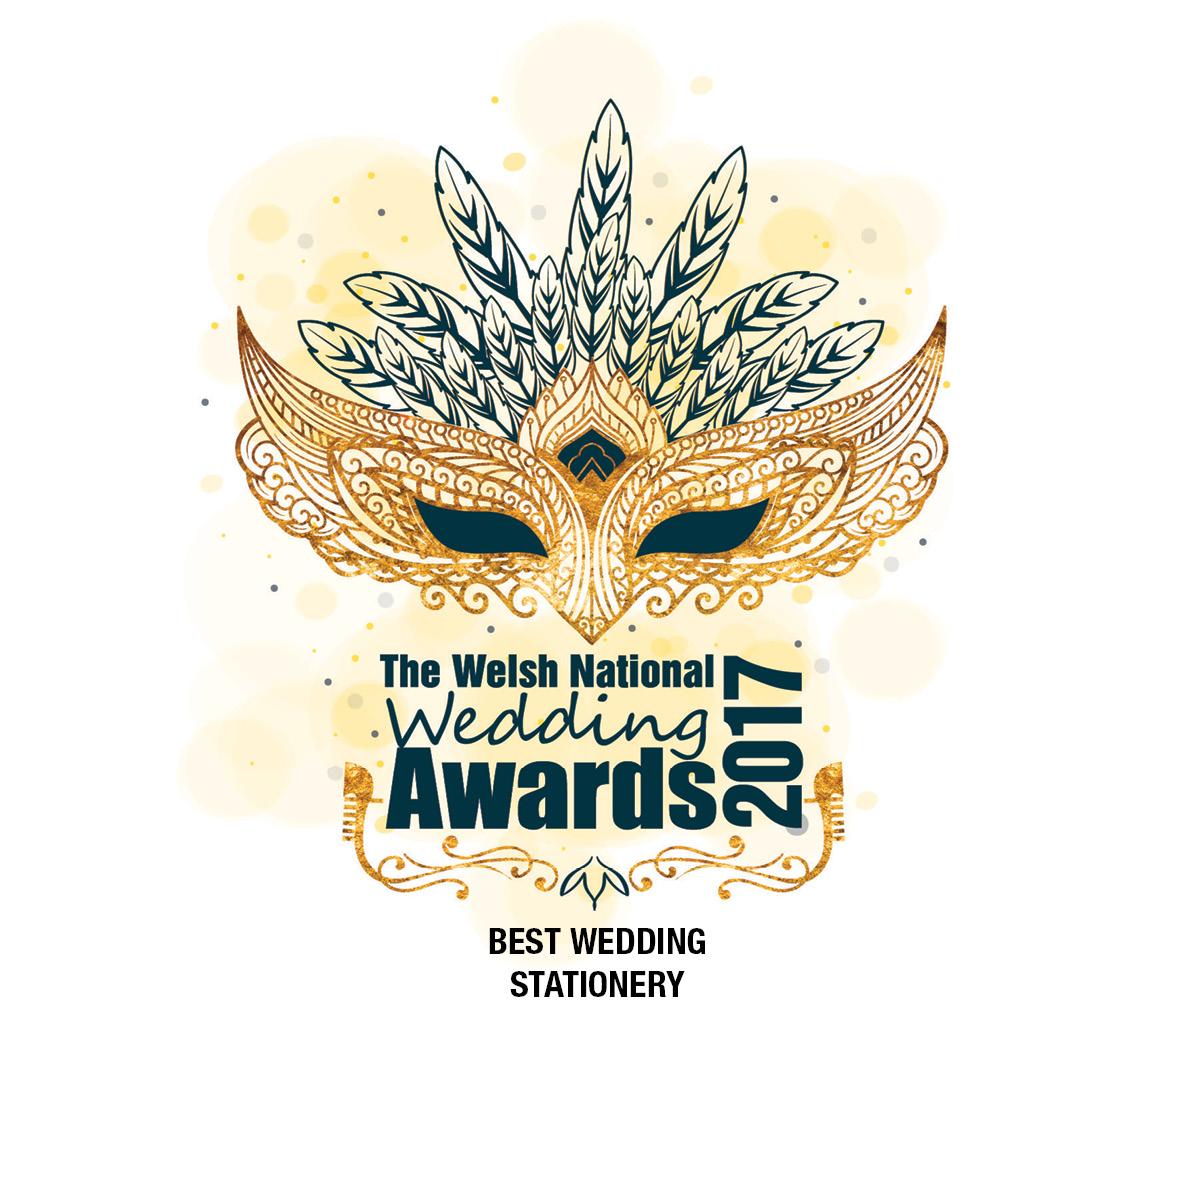 Welsh Wedding Invitations: Best Stationery - Welsh National Wedding Awards 2017